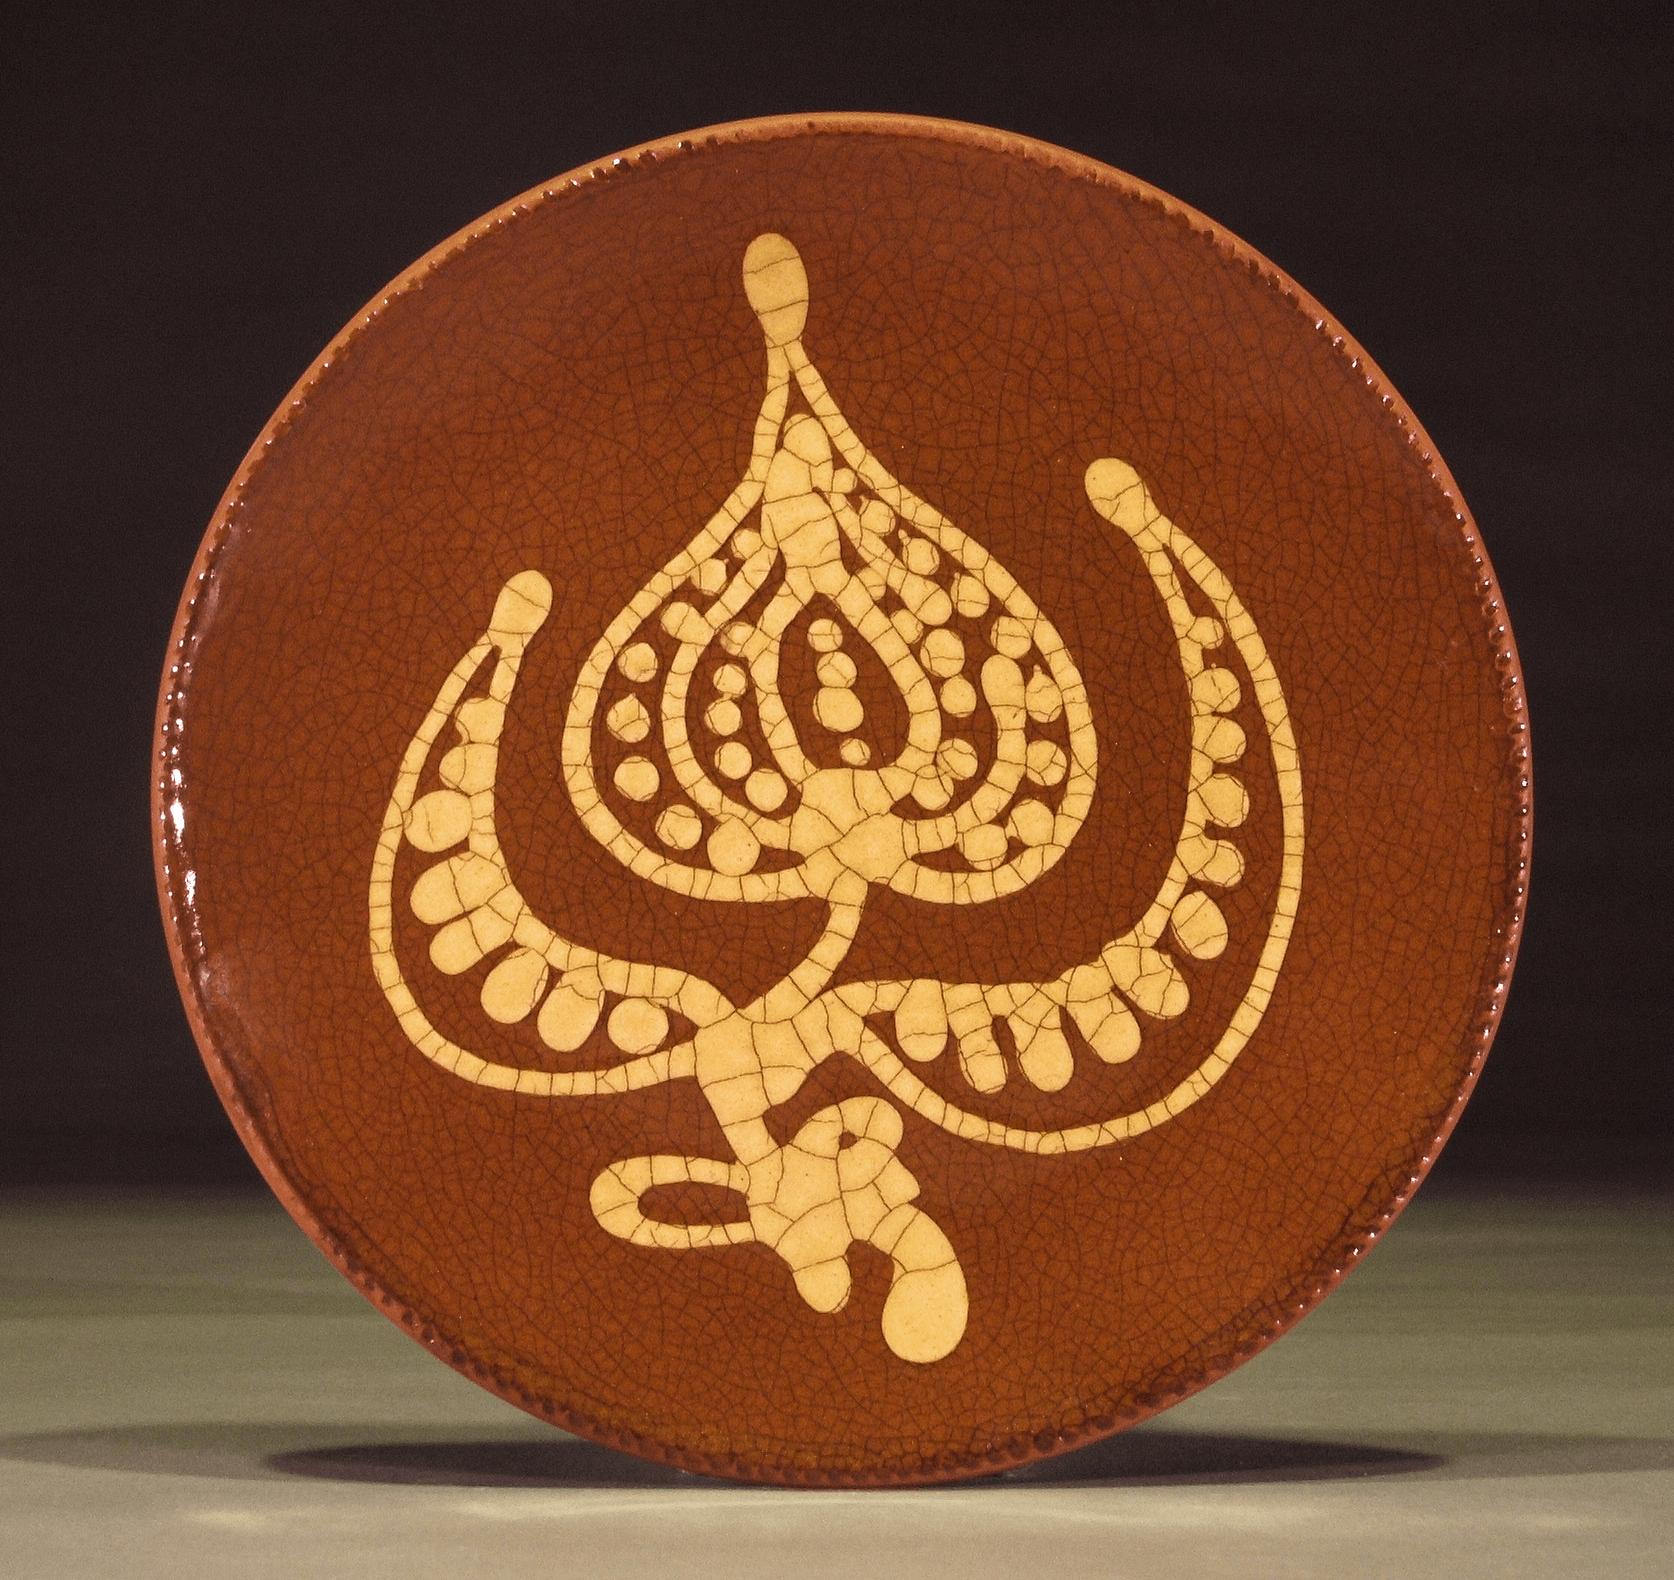 Round Plate, Slipware, Floral Blossom